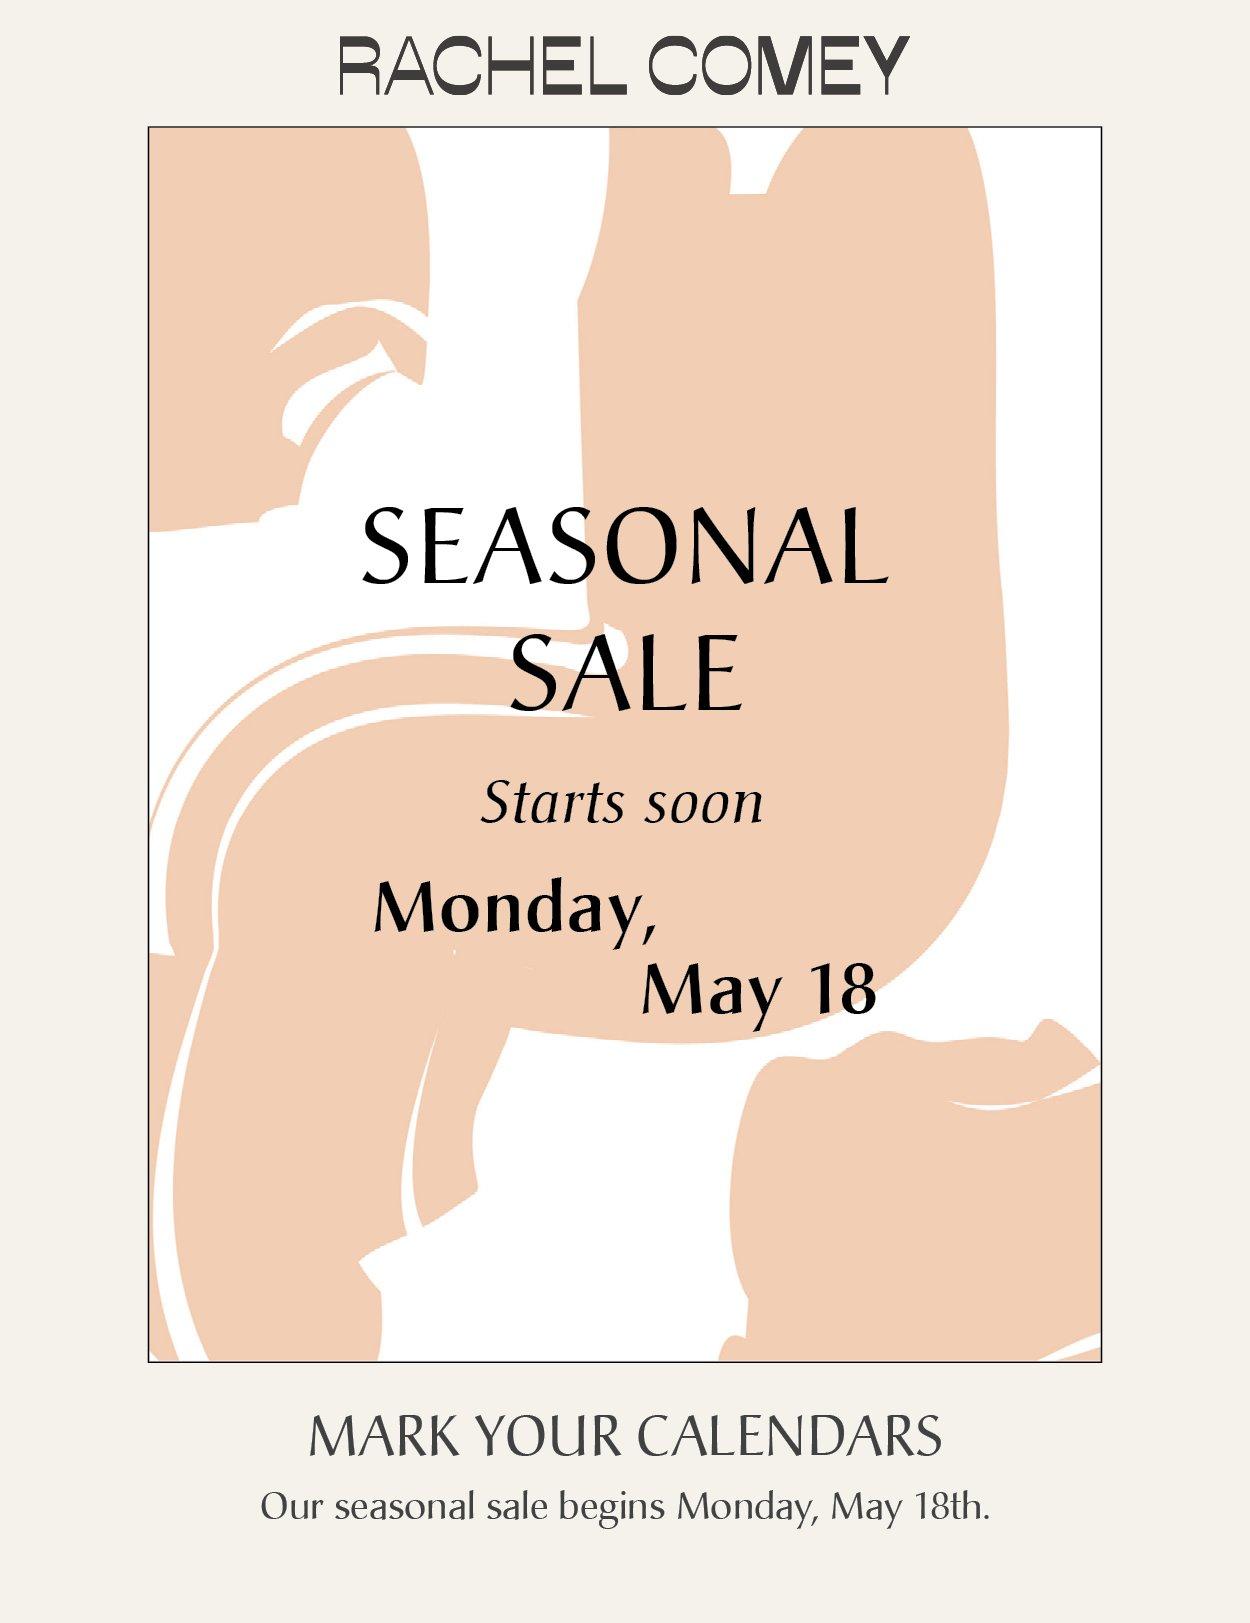 Rachel Comey Mark Your Calendars Seasonal Sale Starts Soon Milled